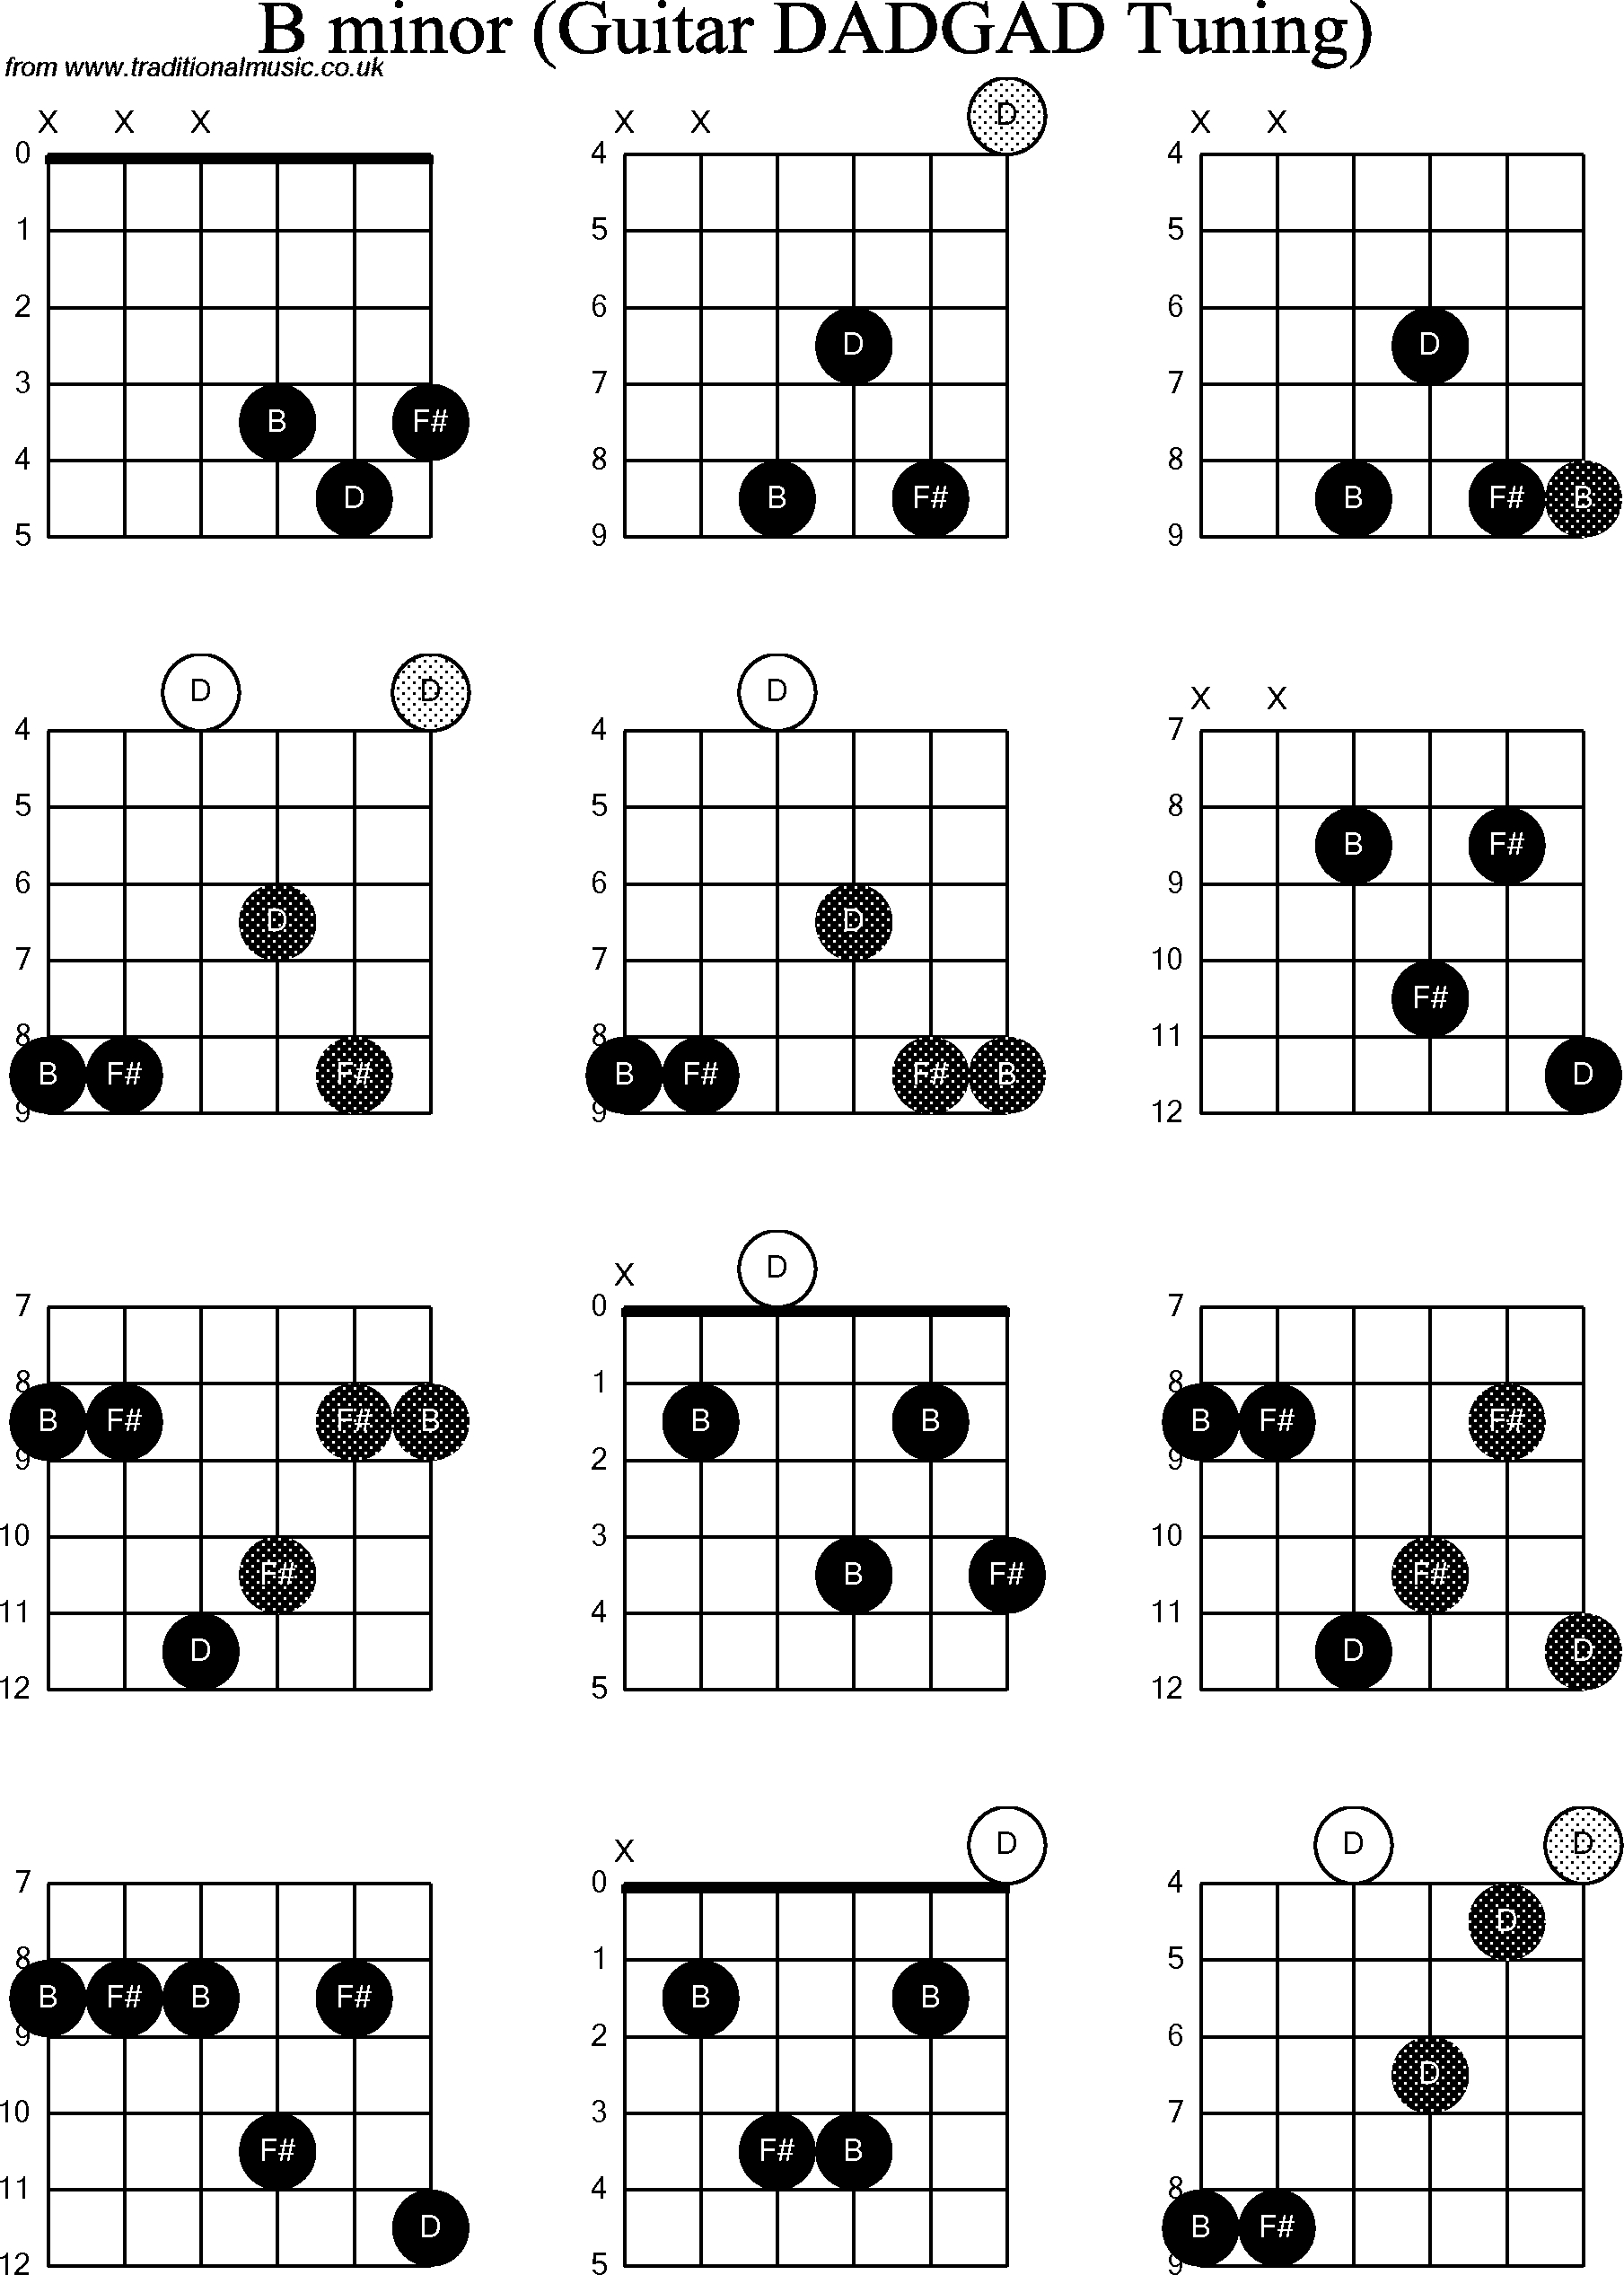 B Minor Guitar Chord Chord Diagrams D Modal Guitar Dadgad B Minor